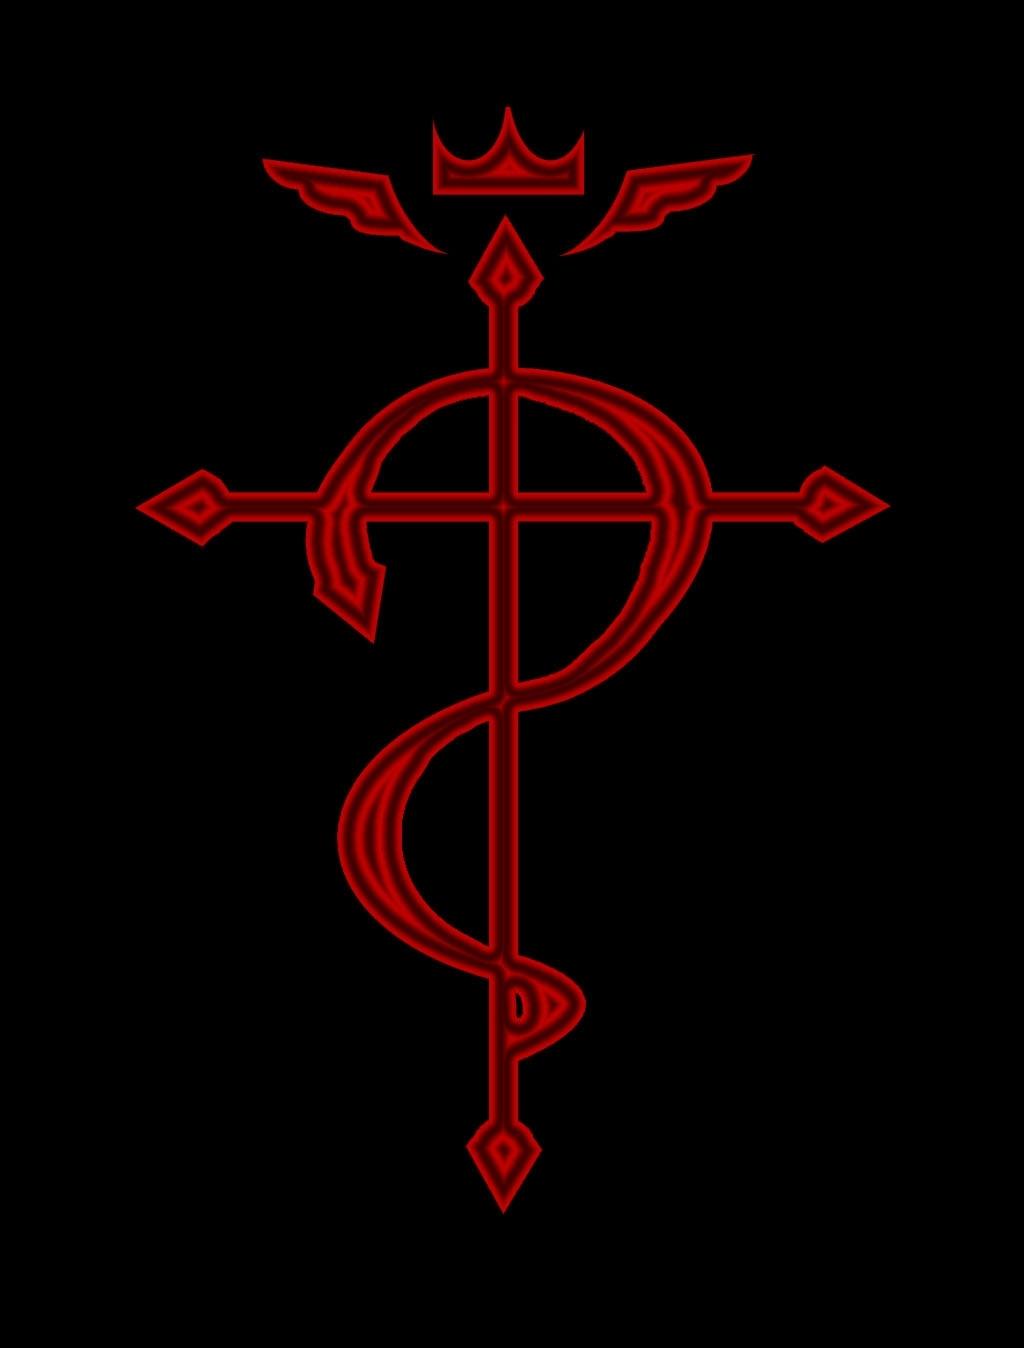 fullmetal alchemist symbolpachyderm11 on deviantart best